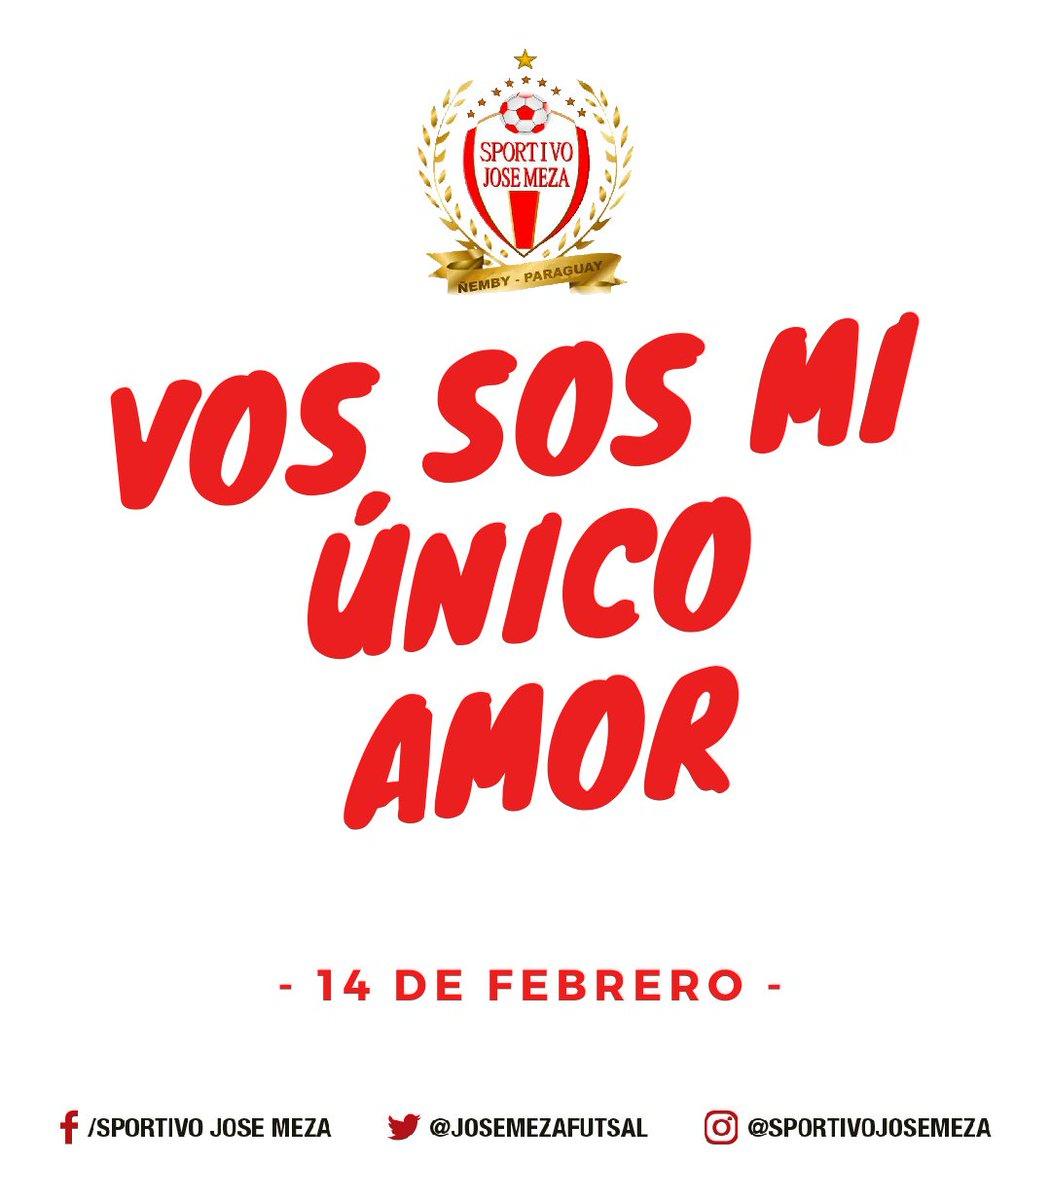 #FelizDiaDeLosEnamorados 🇵🇱🇲🇹 https://t.co/Peti3nSQrv